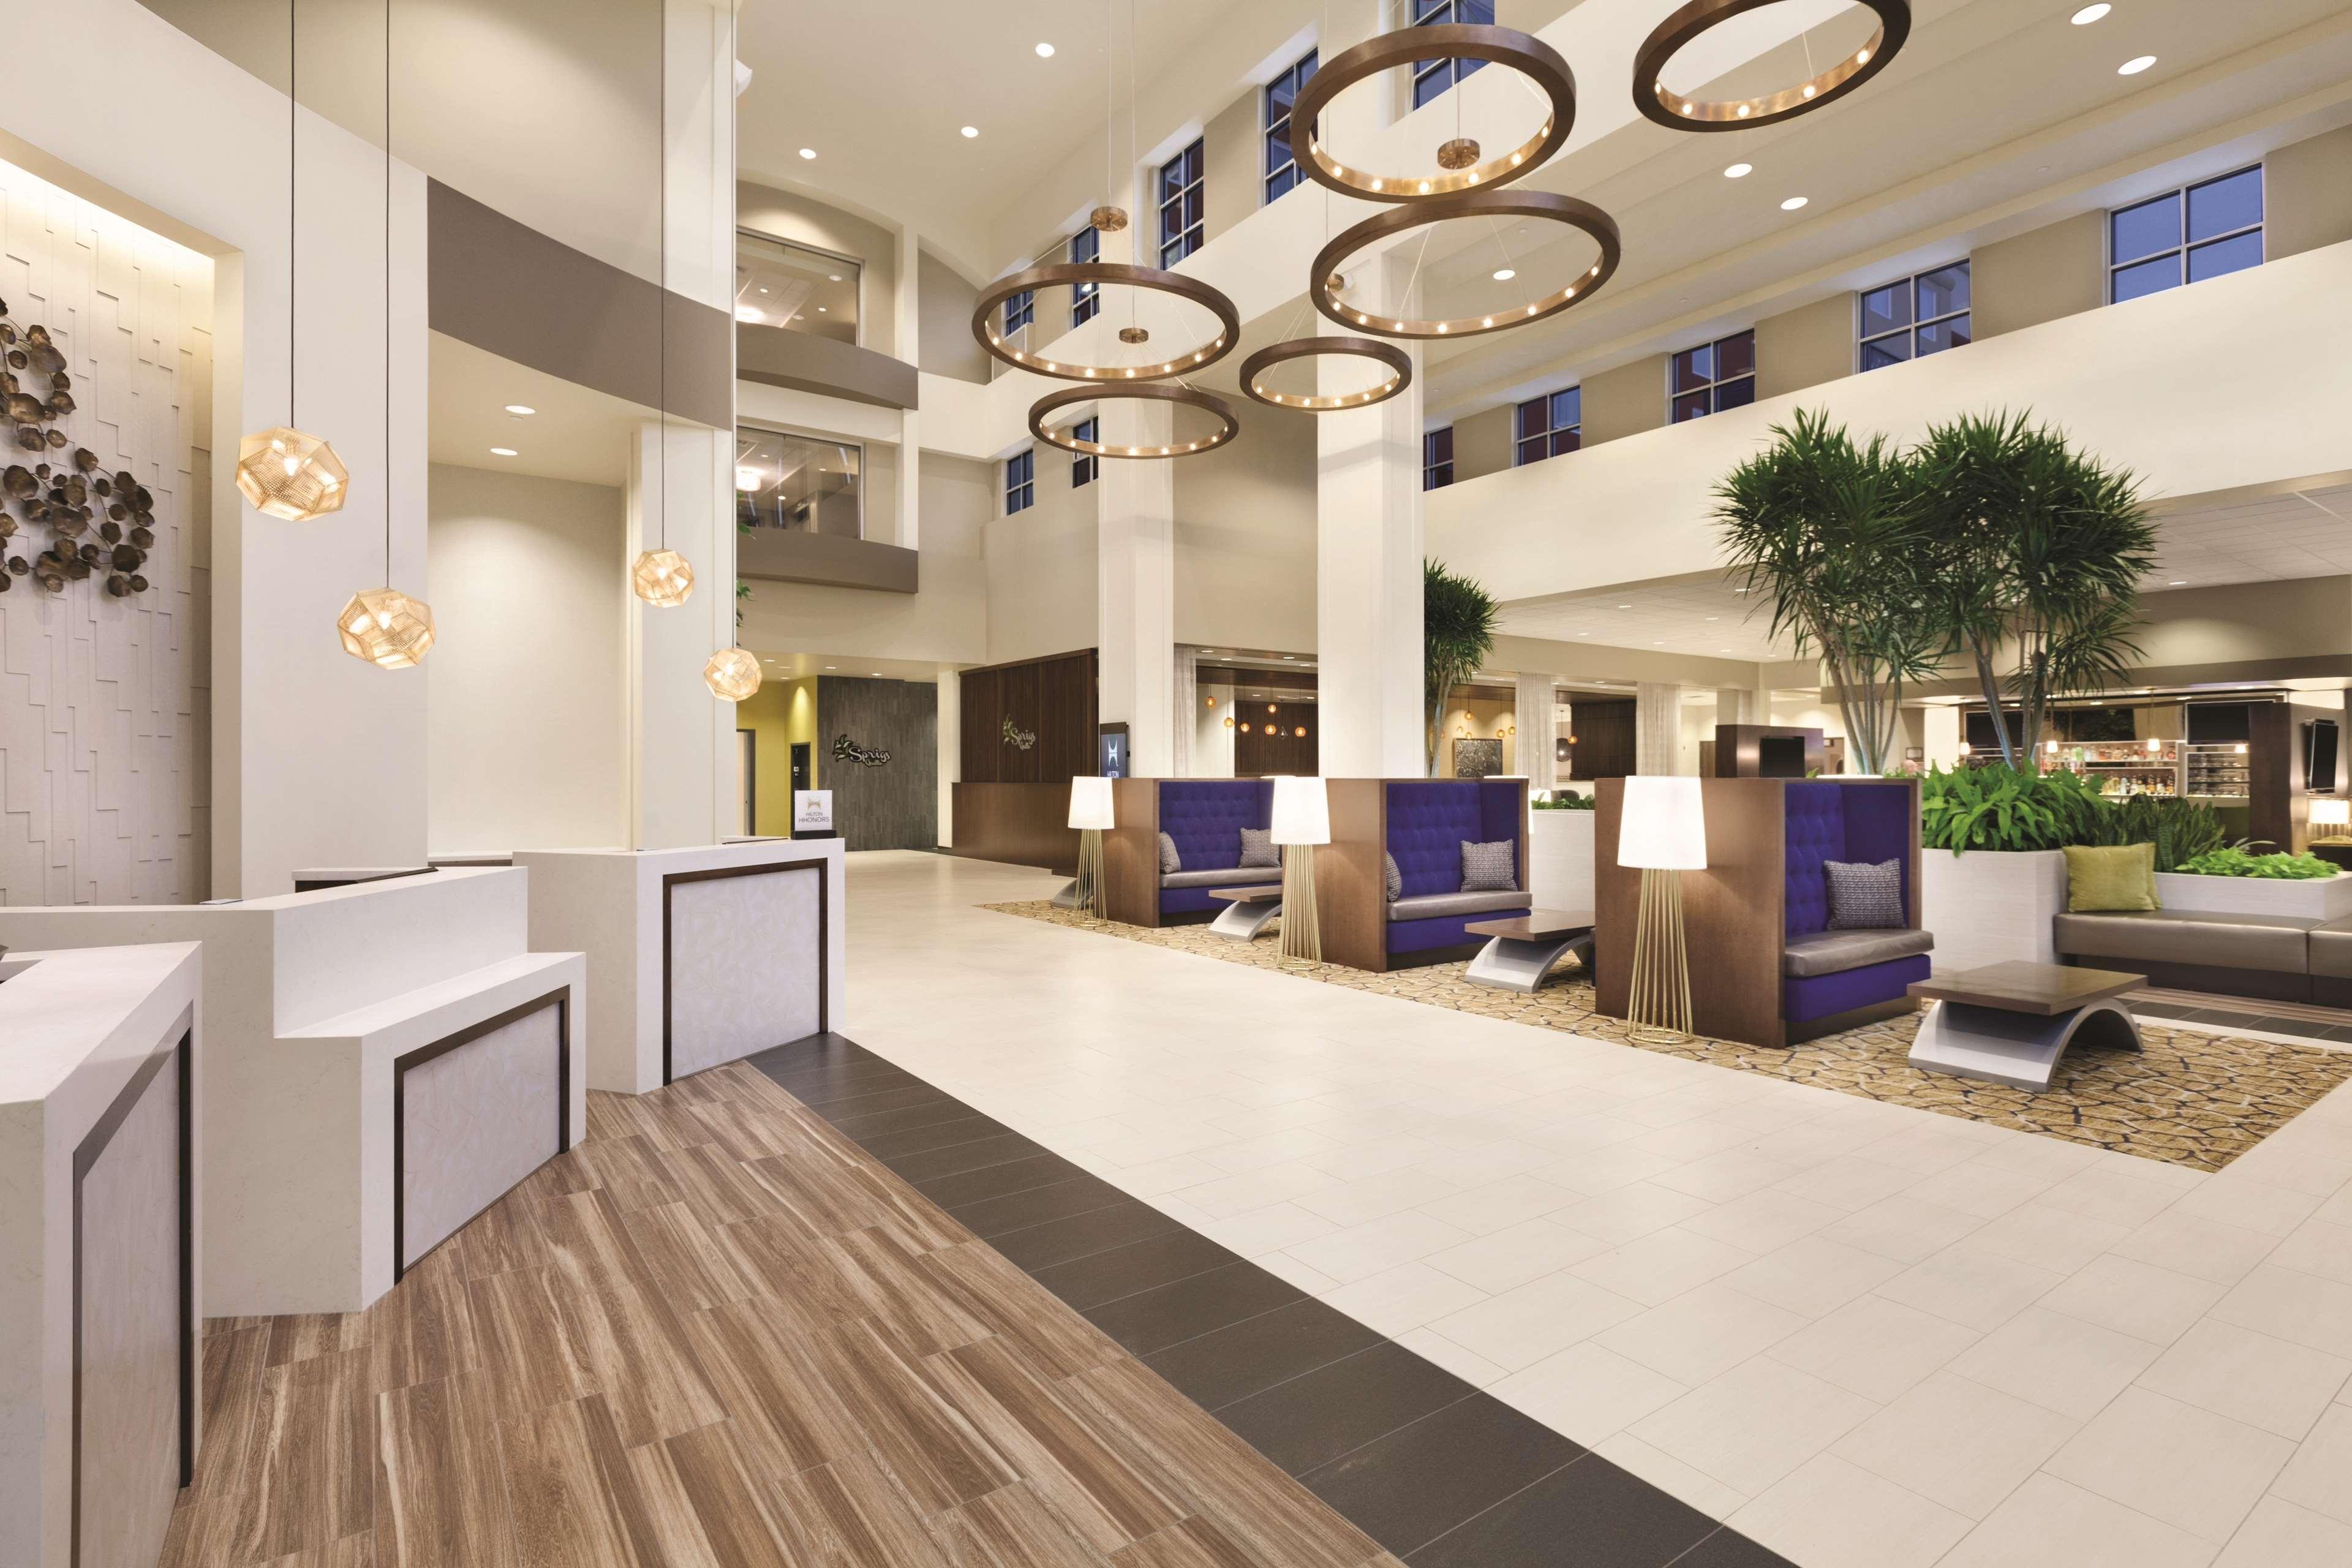 Embassy Suites by Hilton Portland Hillsboro, Oregon image 42